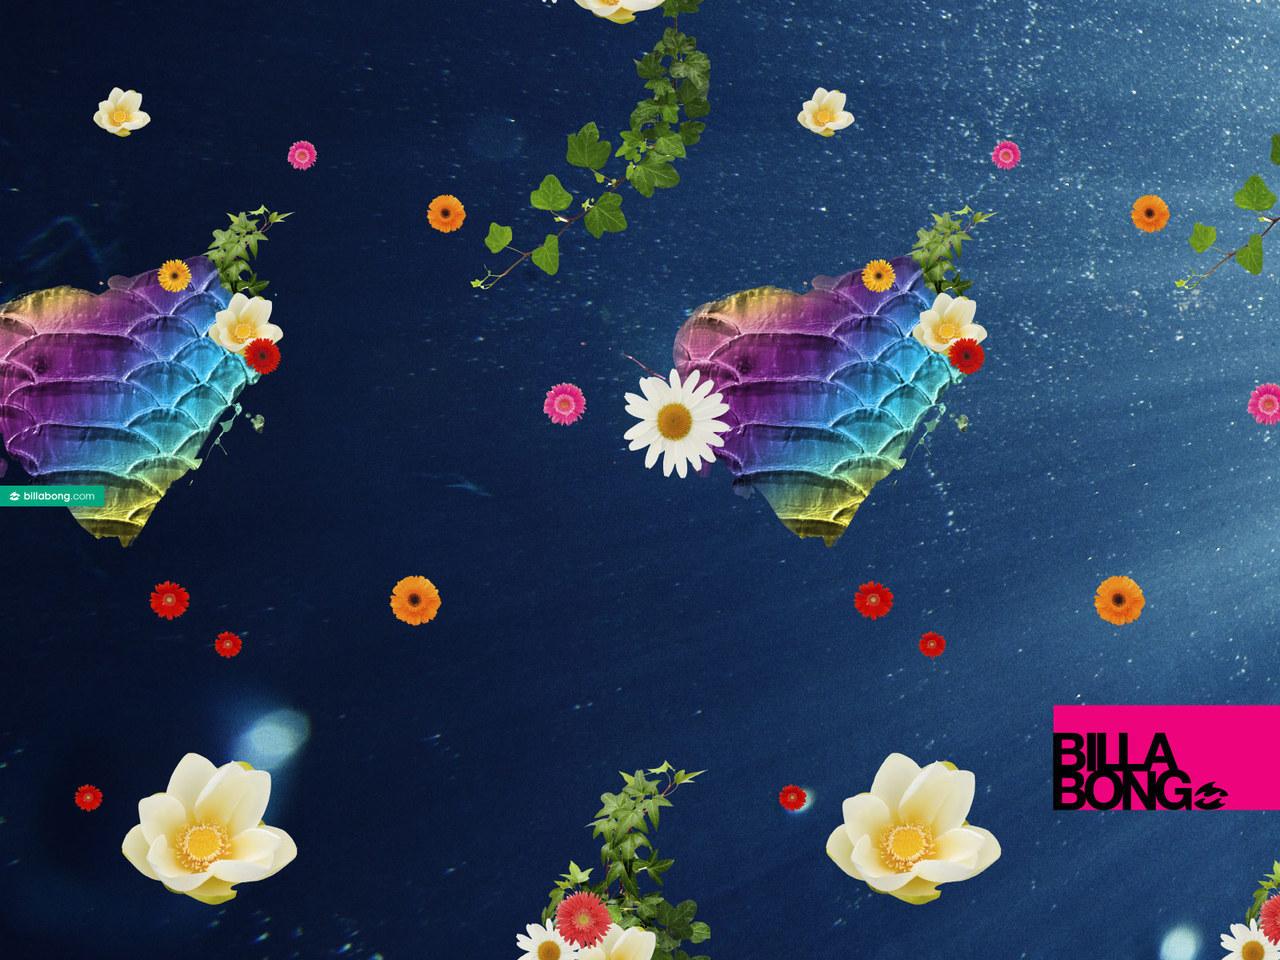 Billabong images Billabong HD wallpaper and background 1280x960